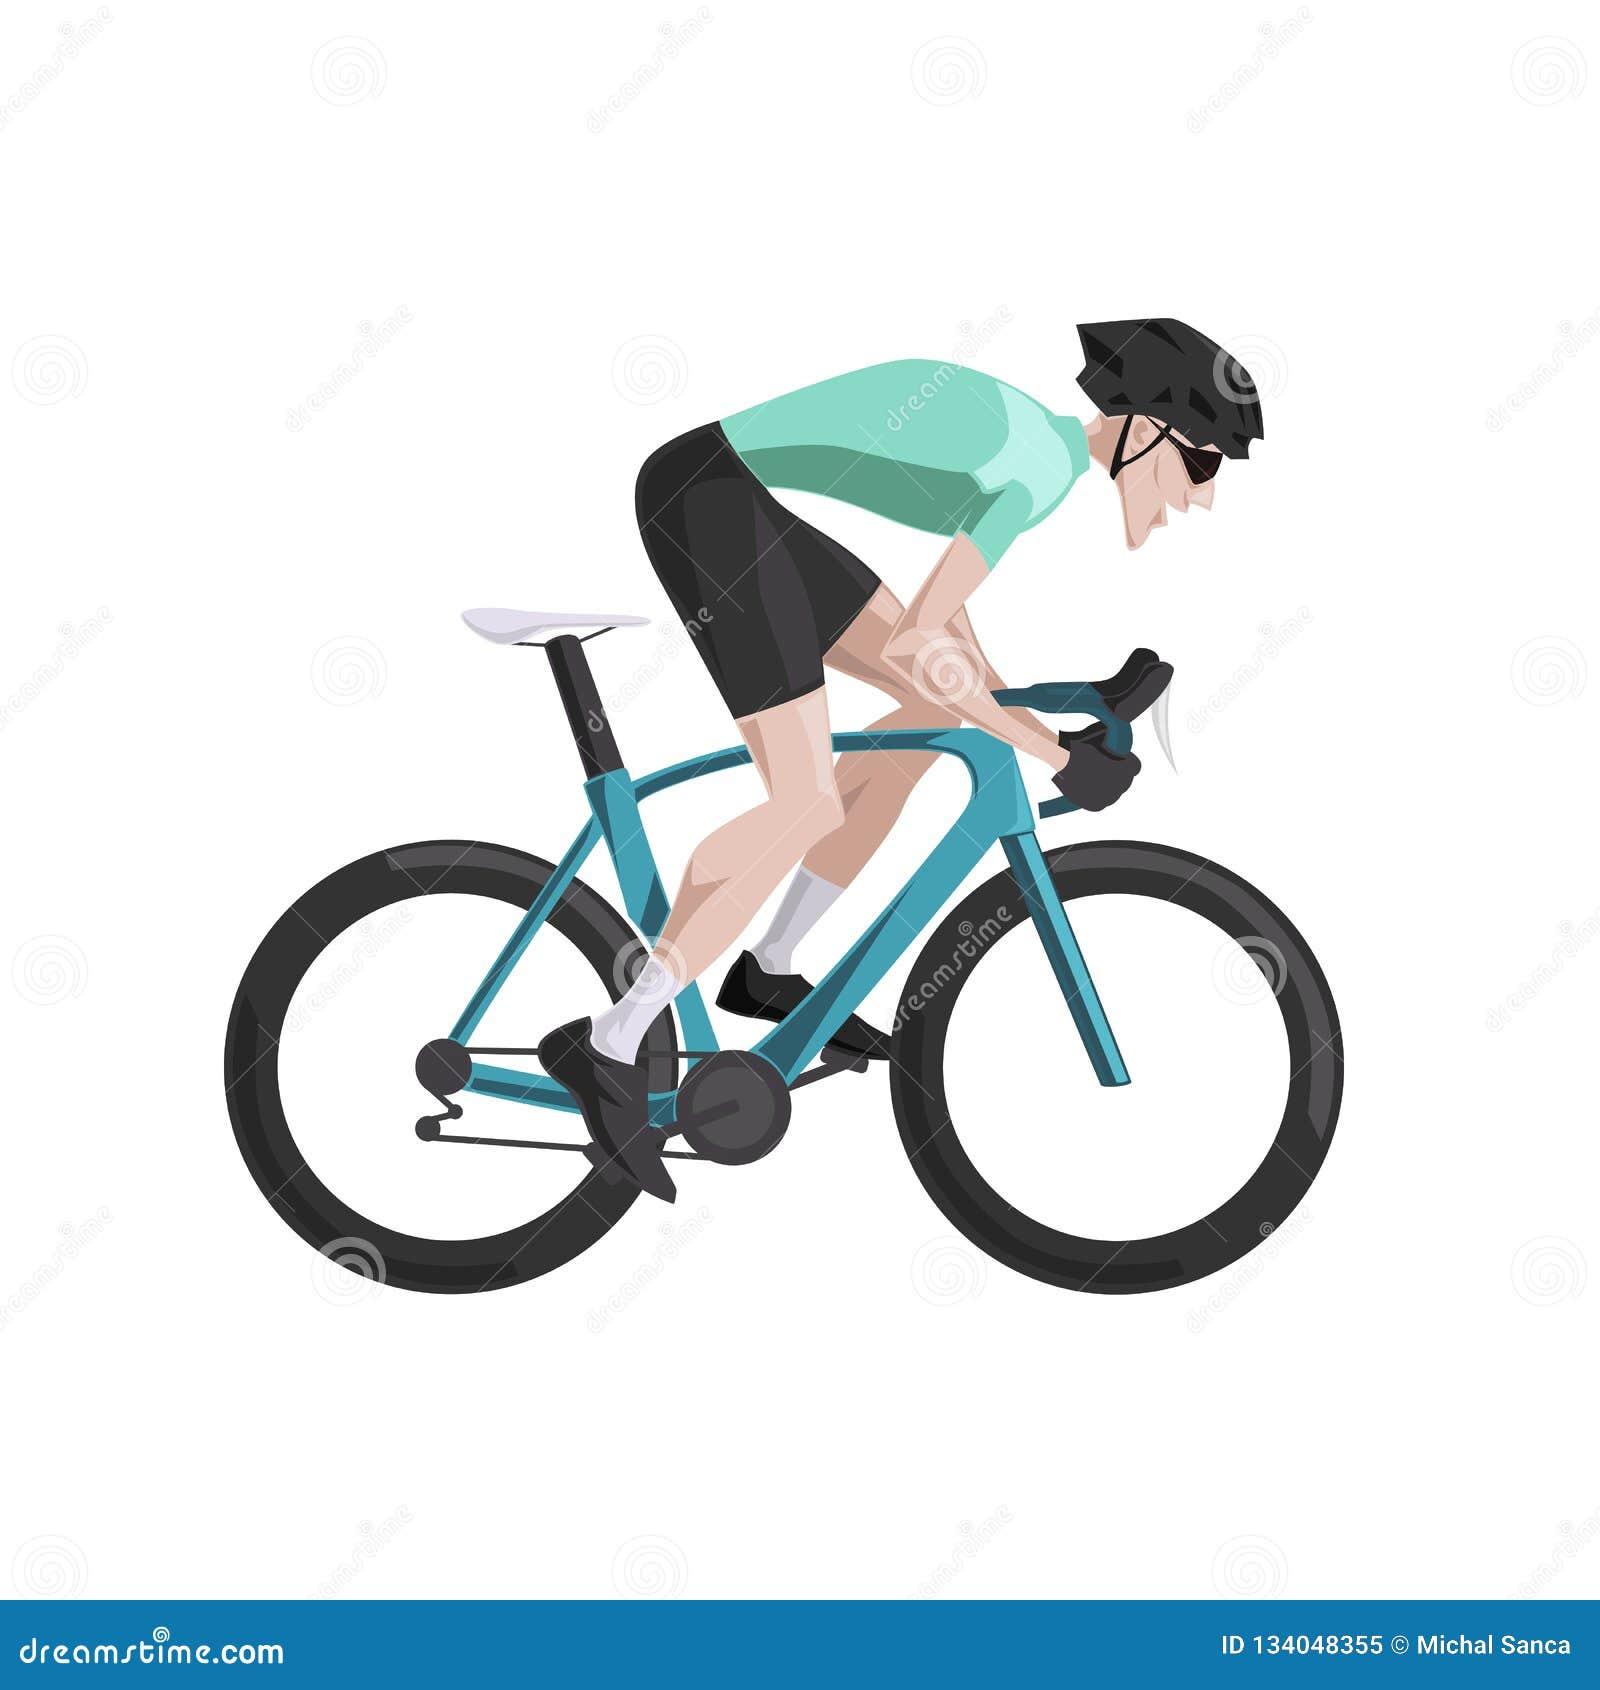 Cycling, cartoon road cyclist riding bike